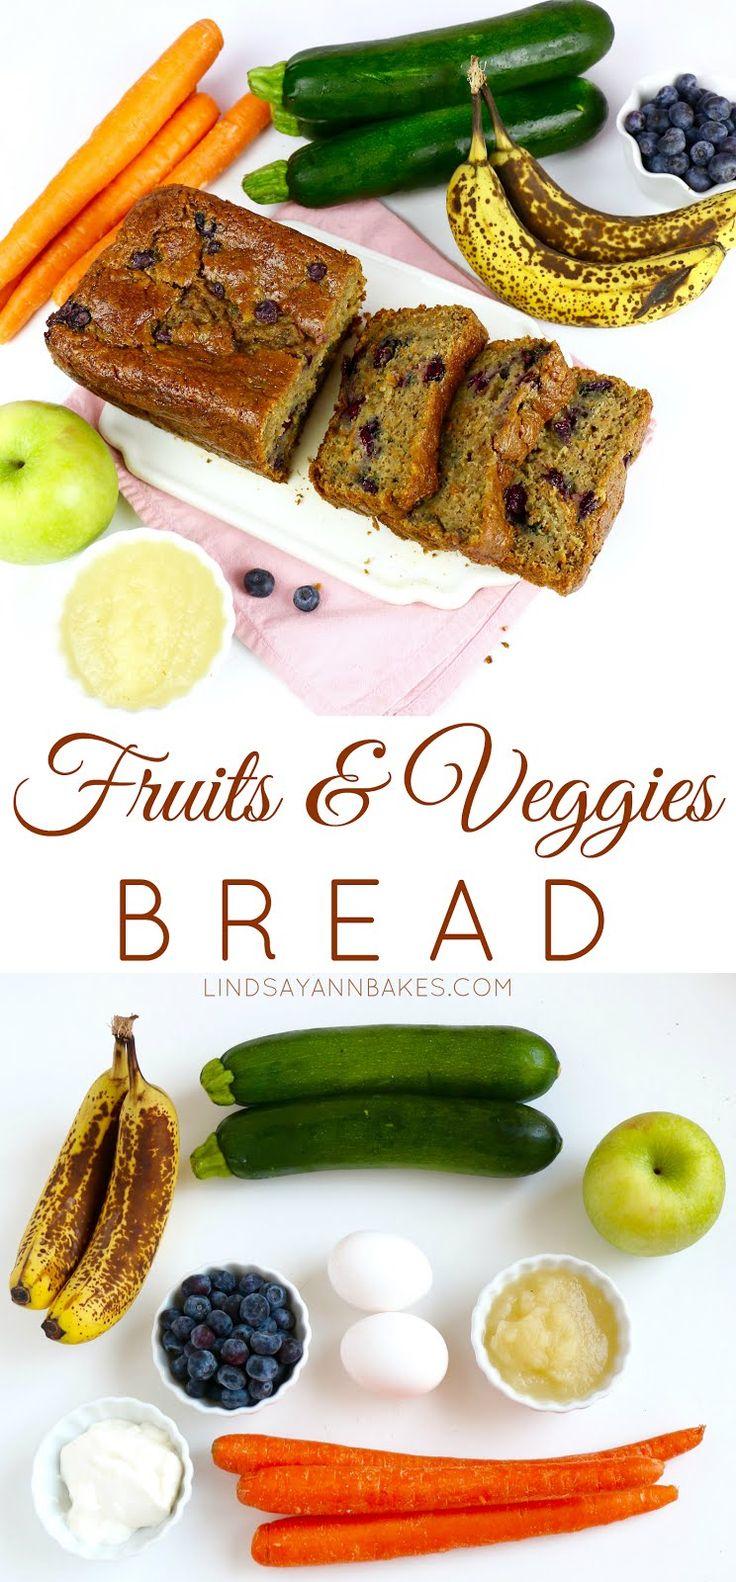 Lindsay Ann Bakes: Fruits & Veggies Bread (packed with banana, zucchini, carrot, apple, blueberry and greek yogurt!)